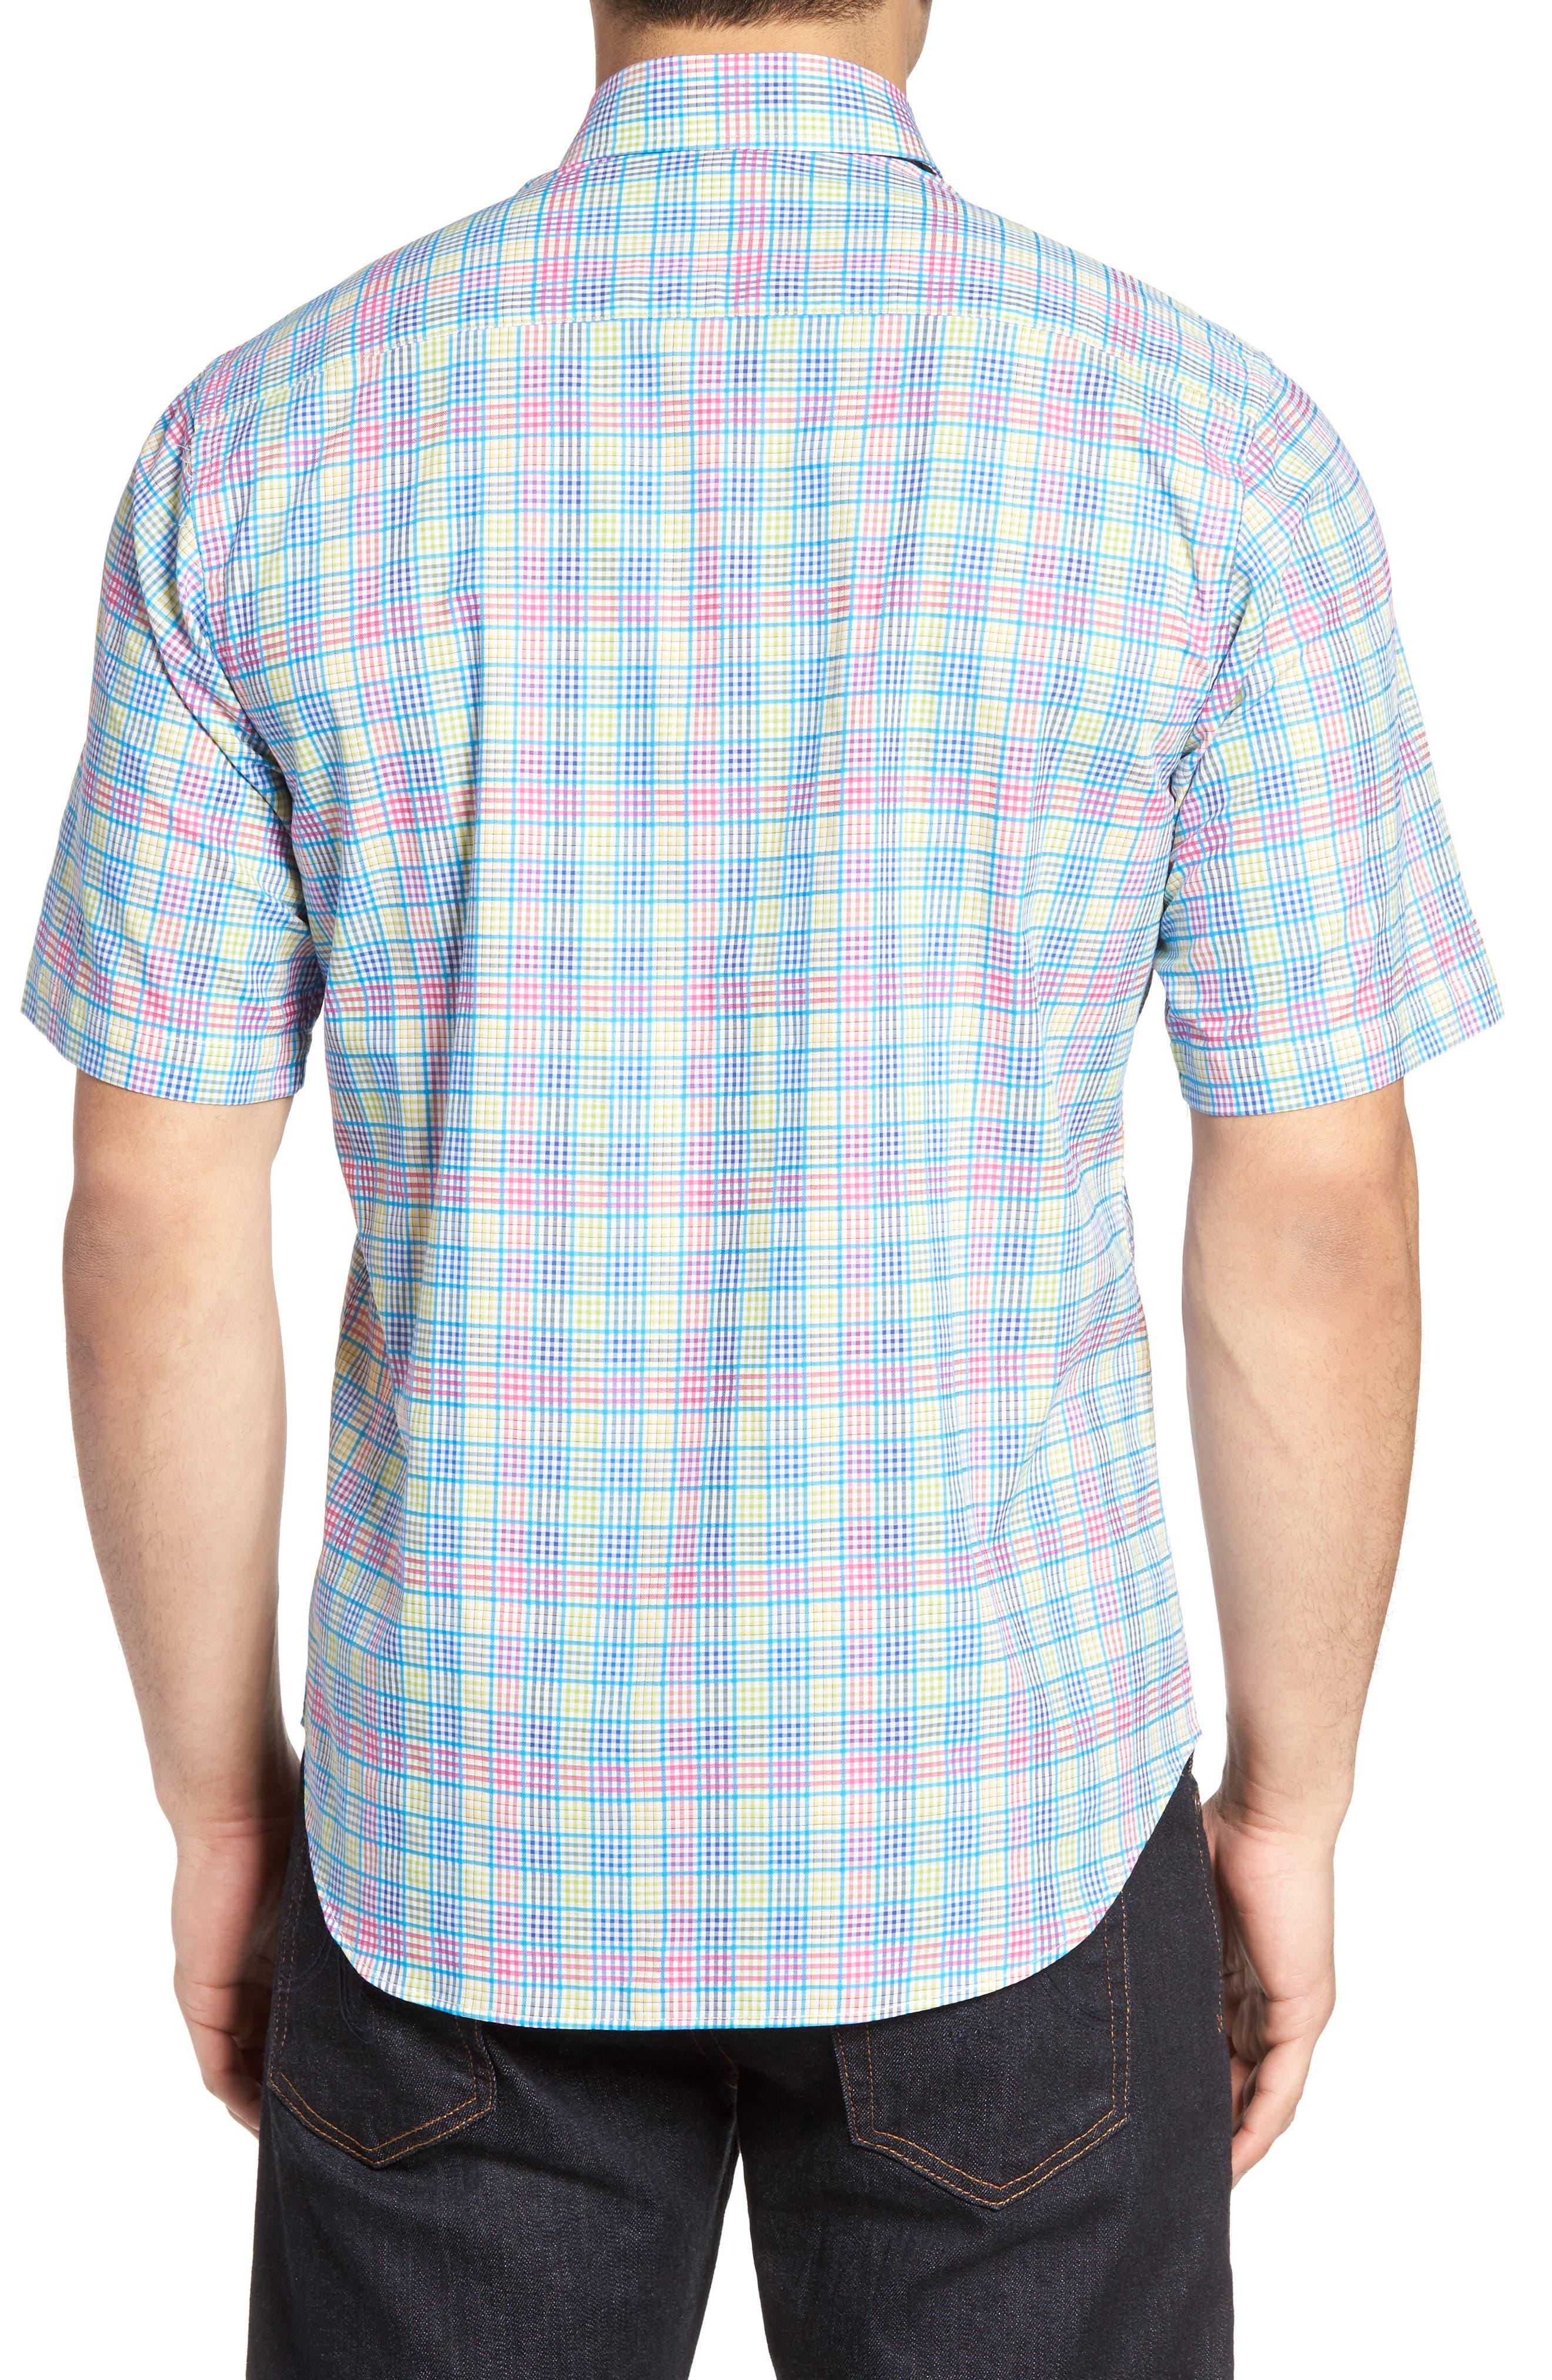 Lemon Plaid Sport Shirt,                             Alternate thumbnail 2, color,                             Blue/ Lime